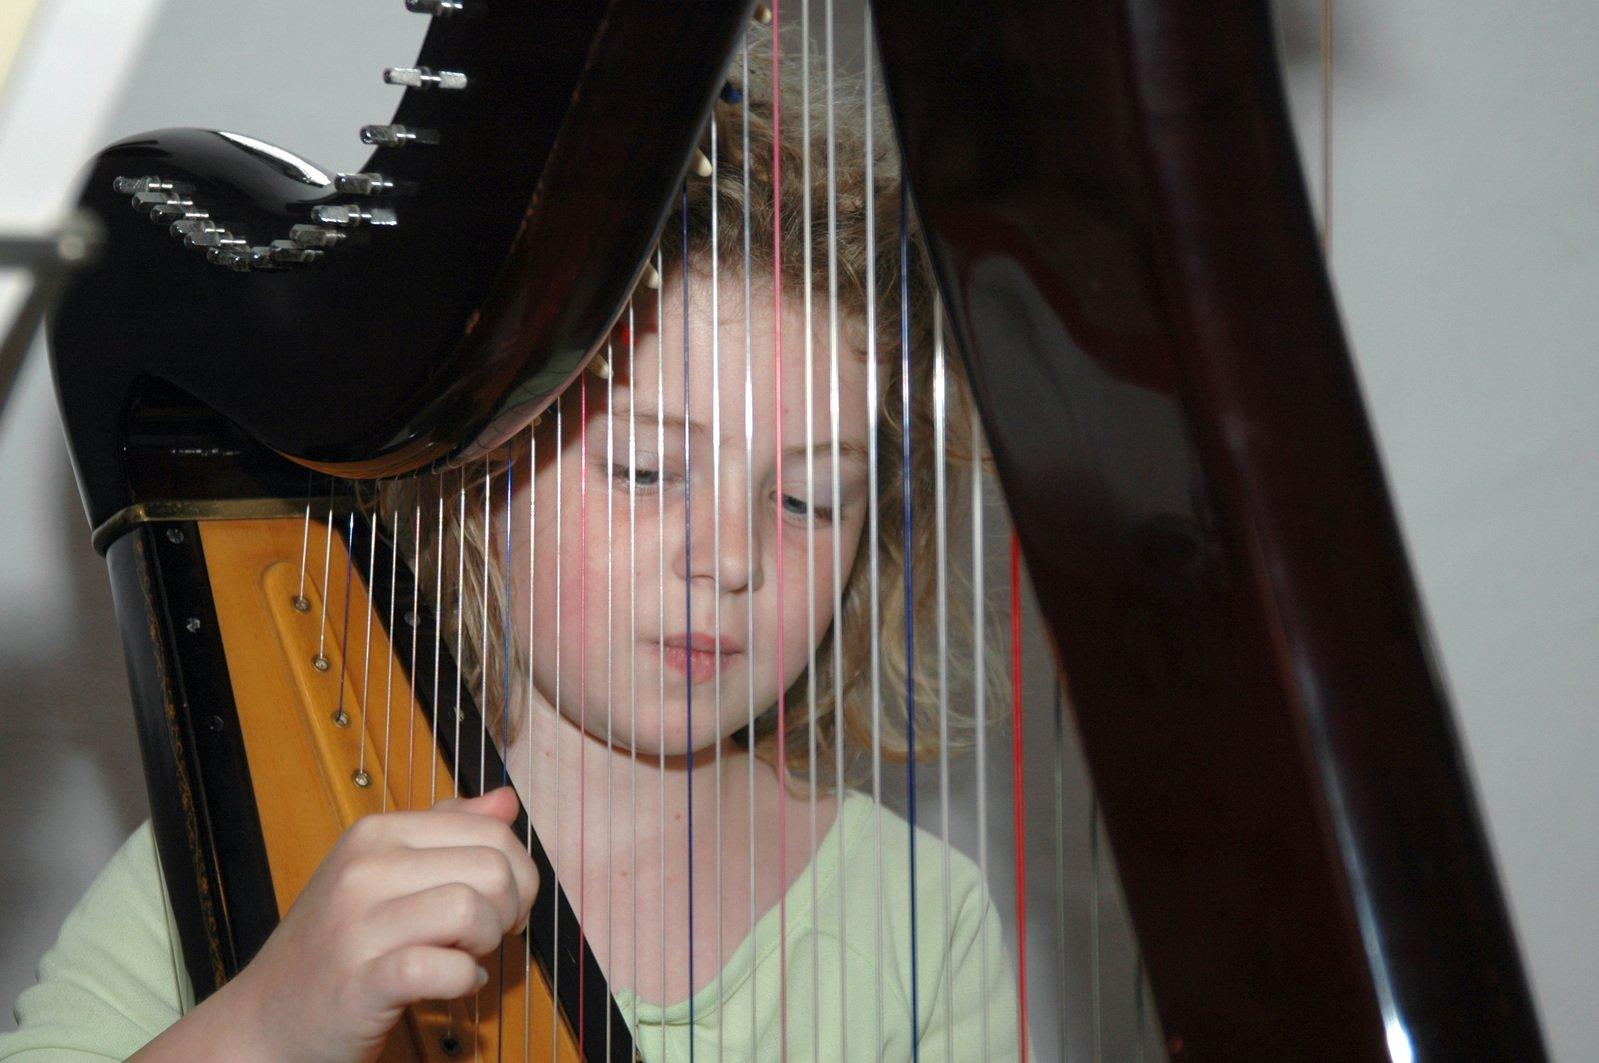 Kinderflute Of Ithacamusic Studio Of Lisa Craig Fenwick